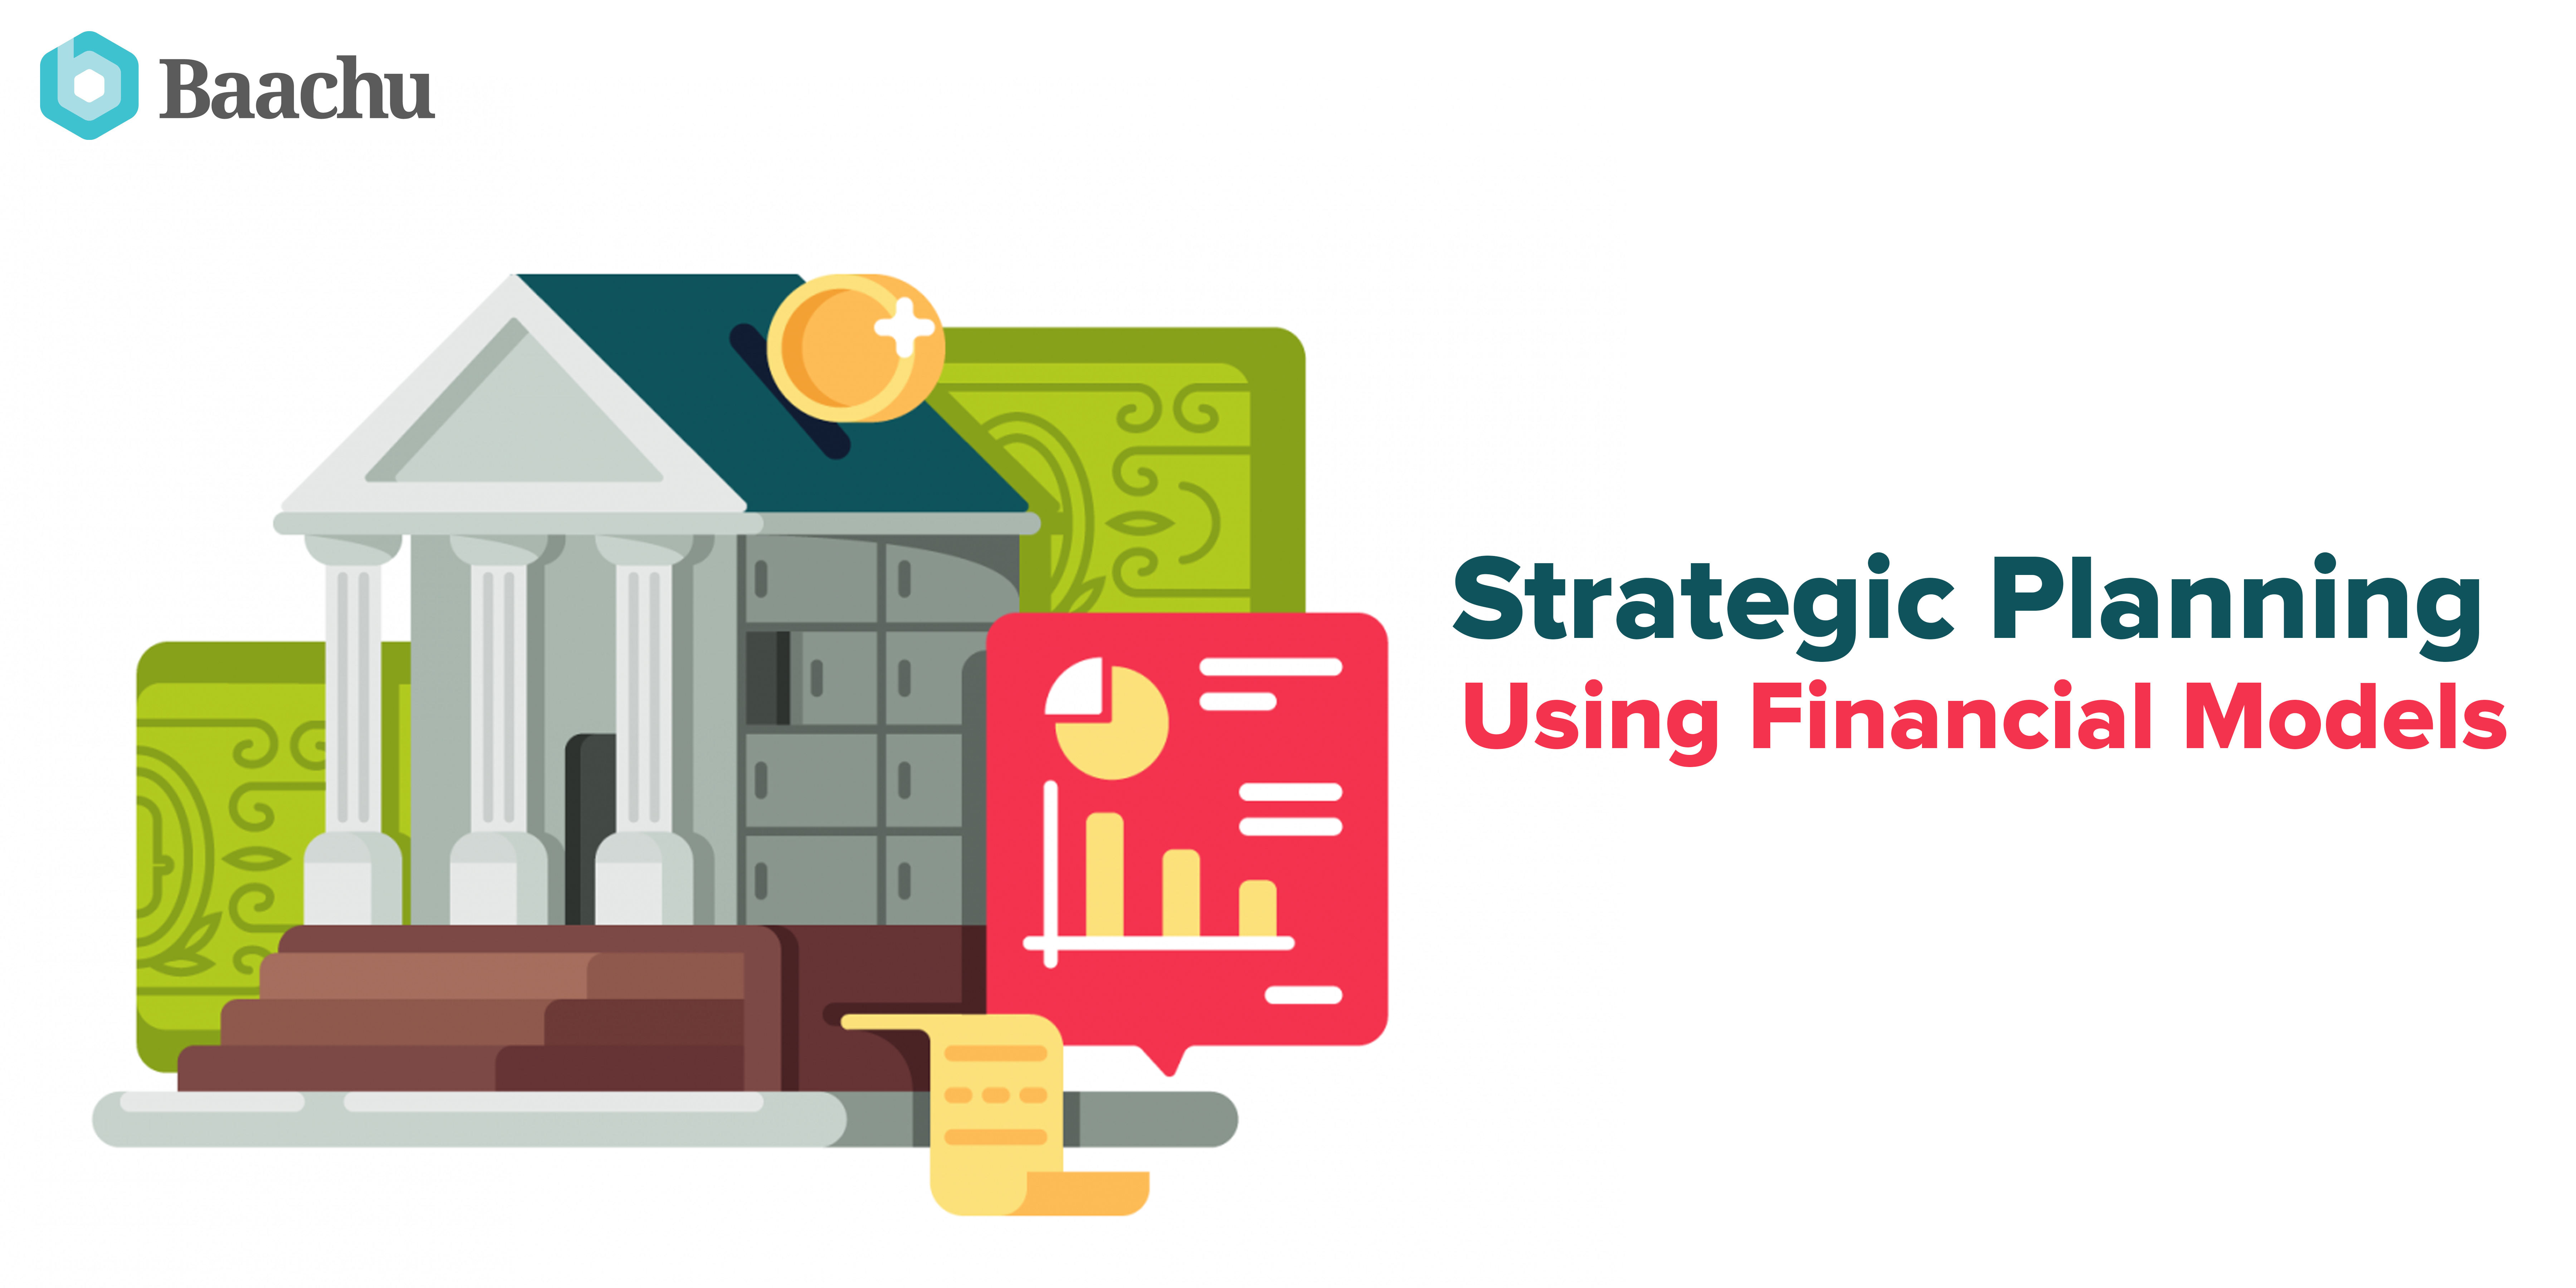 Strategic Planning Using Financial Models